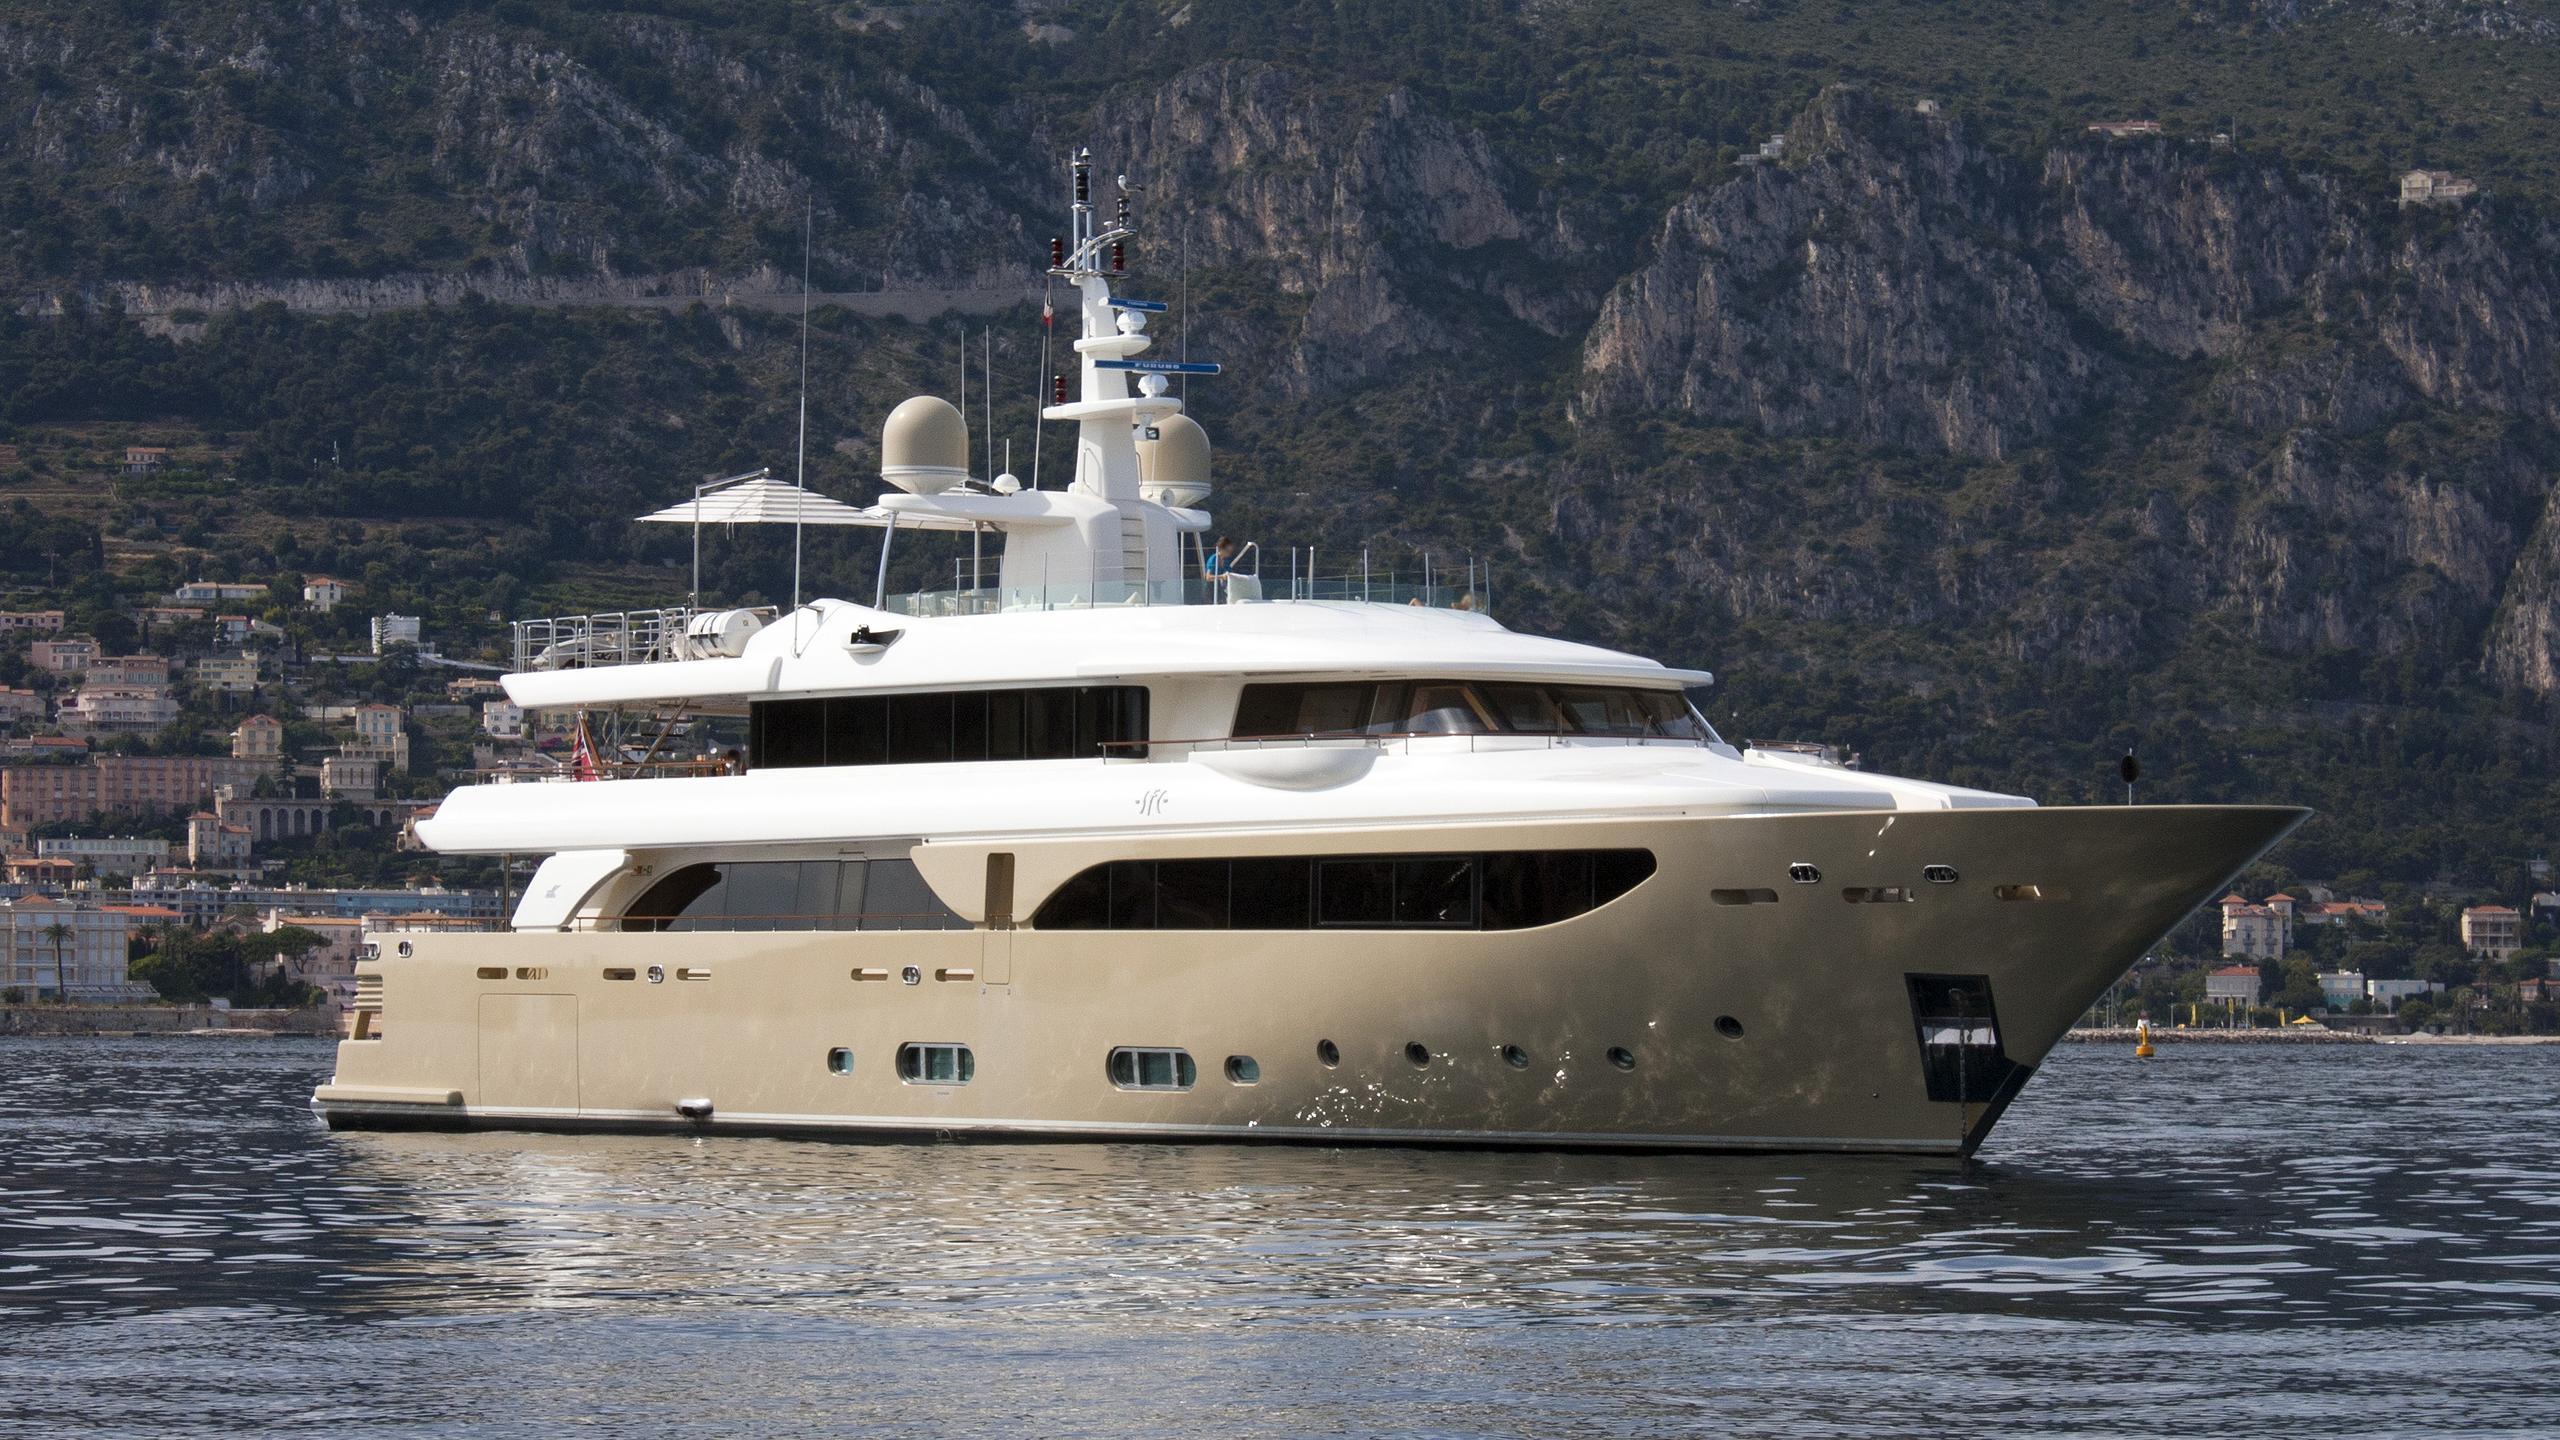 sofico-motor-yacht-crn-43m-2009-half-profile